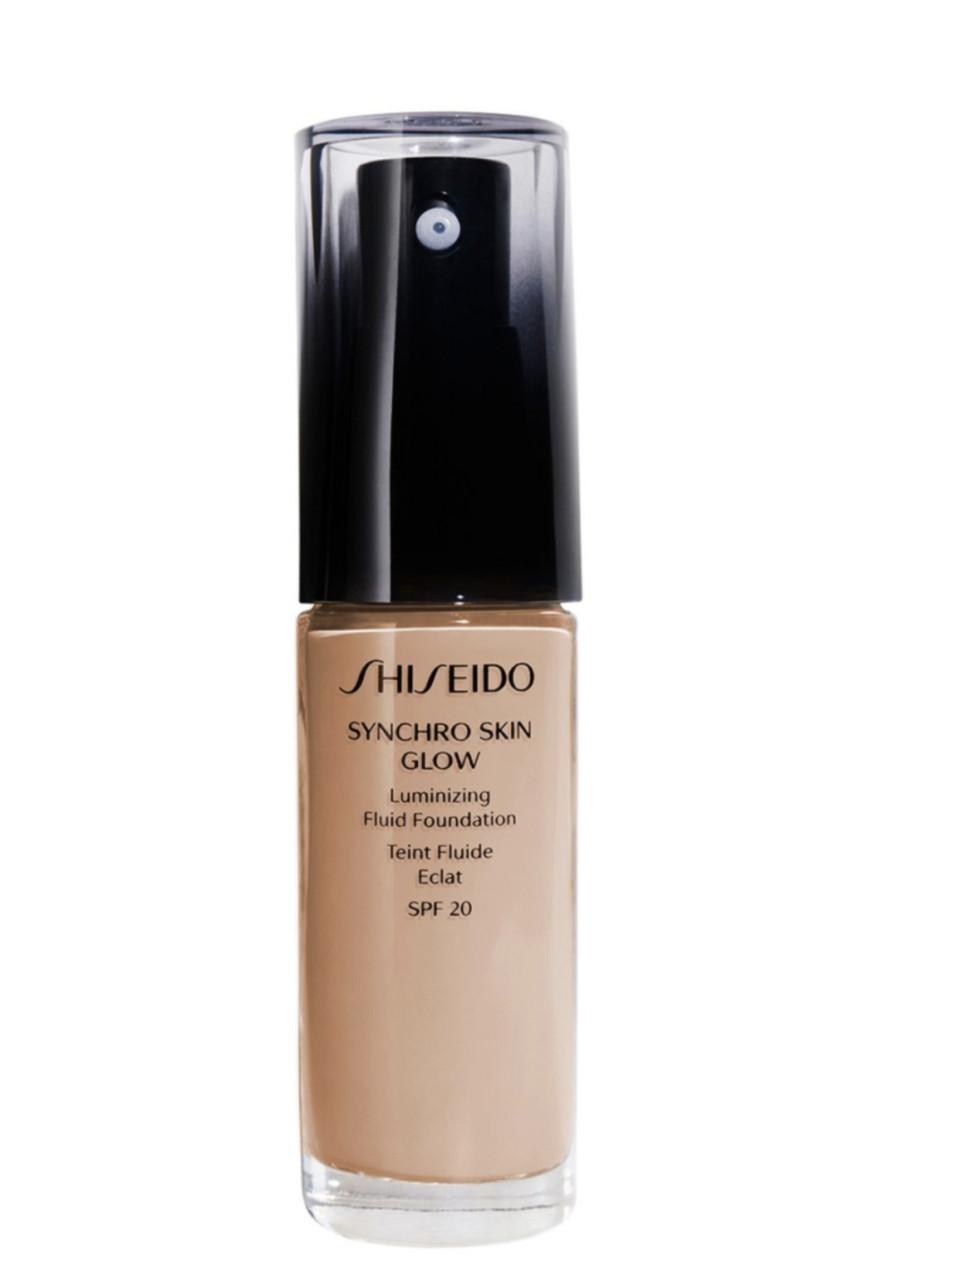 Тональная основа Shiseido Synchro Skin Glow Luminizing Fluid Foundation SPF 20 - N1 Neutral